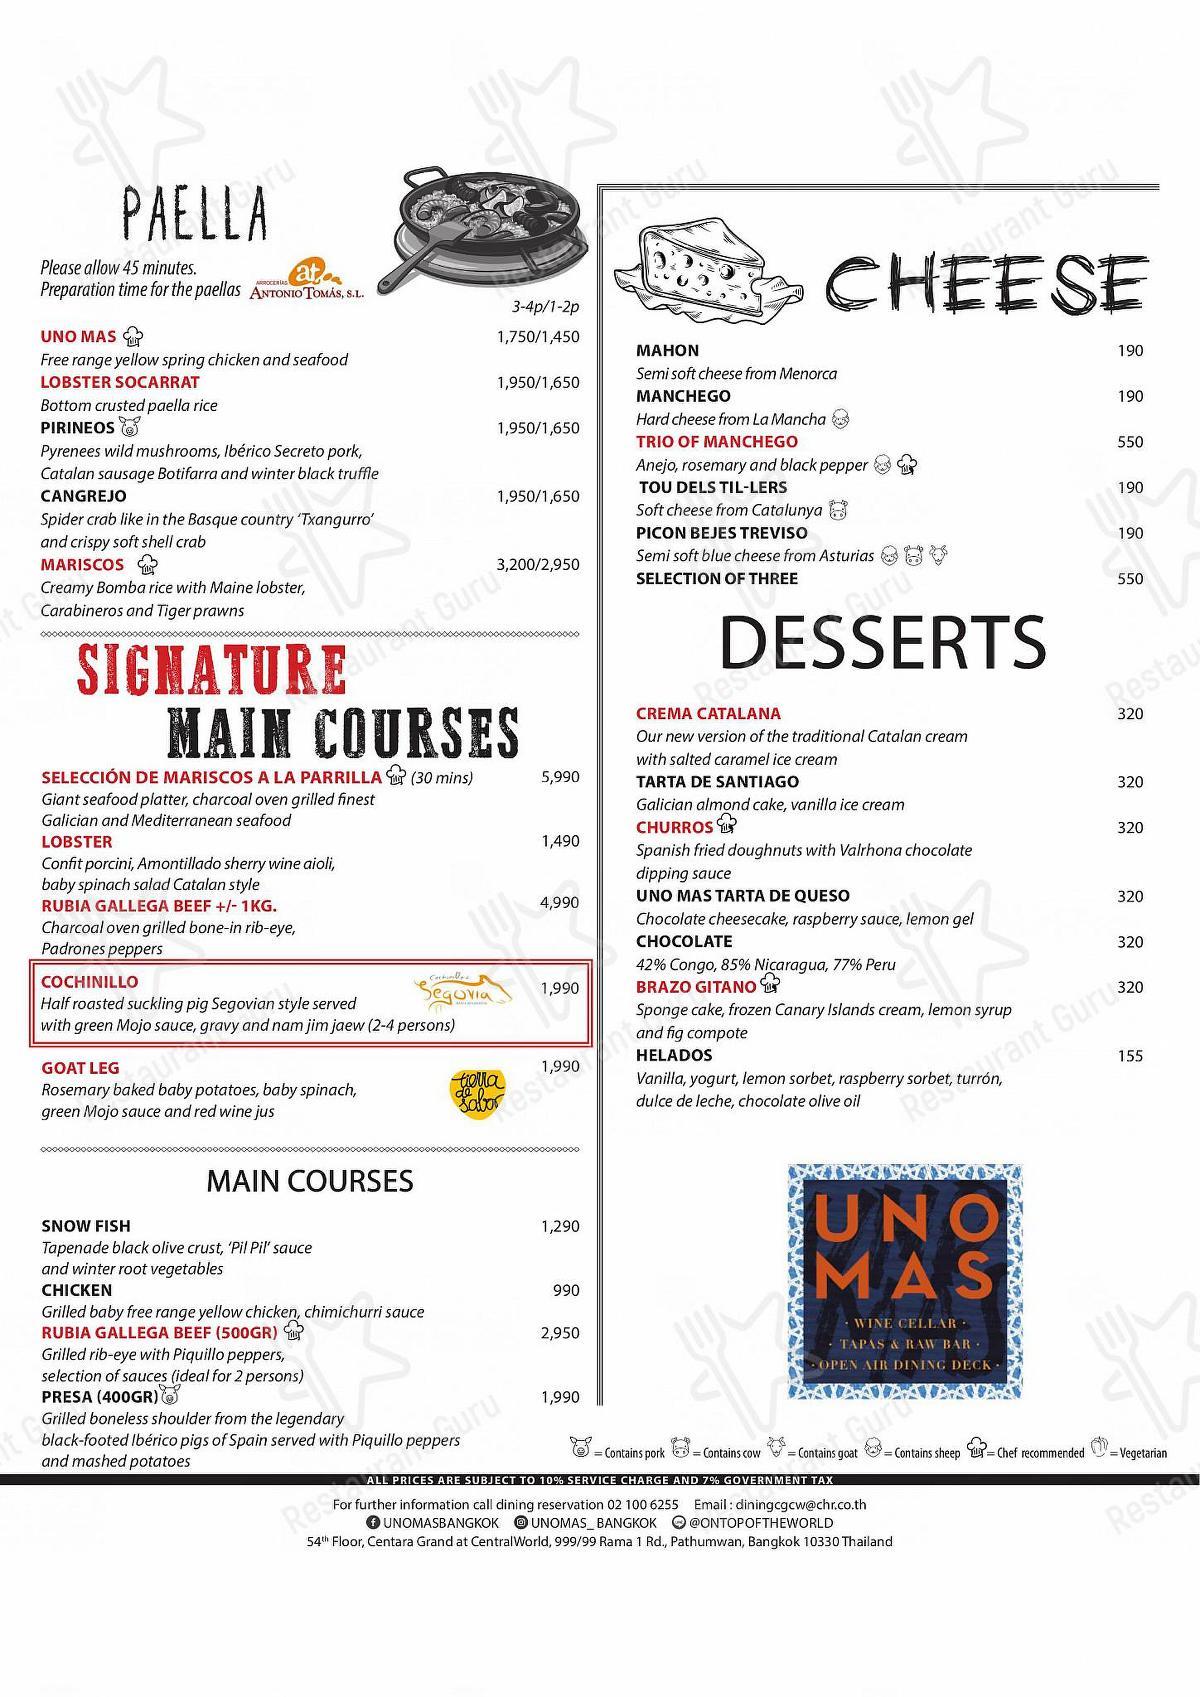 Uno Mas menu - meals and drinks